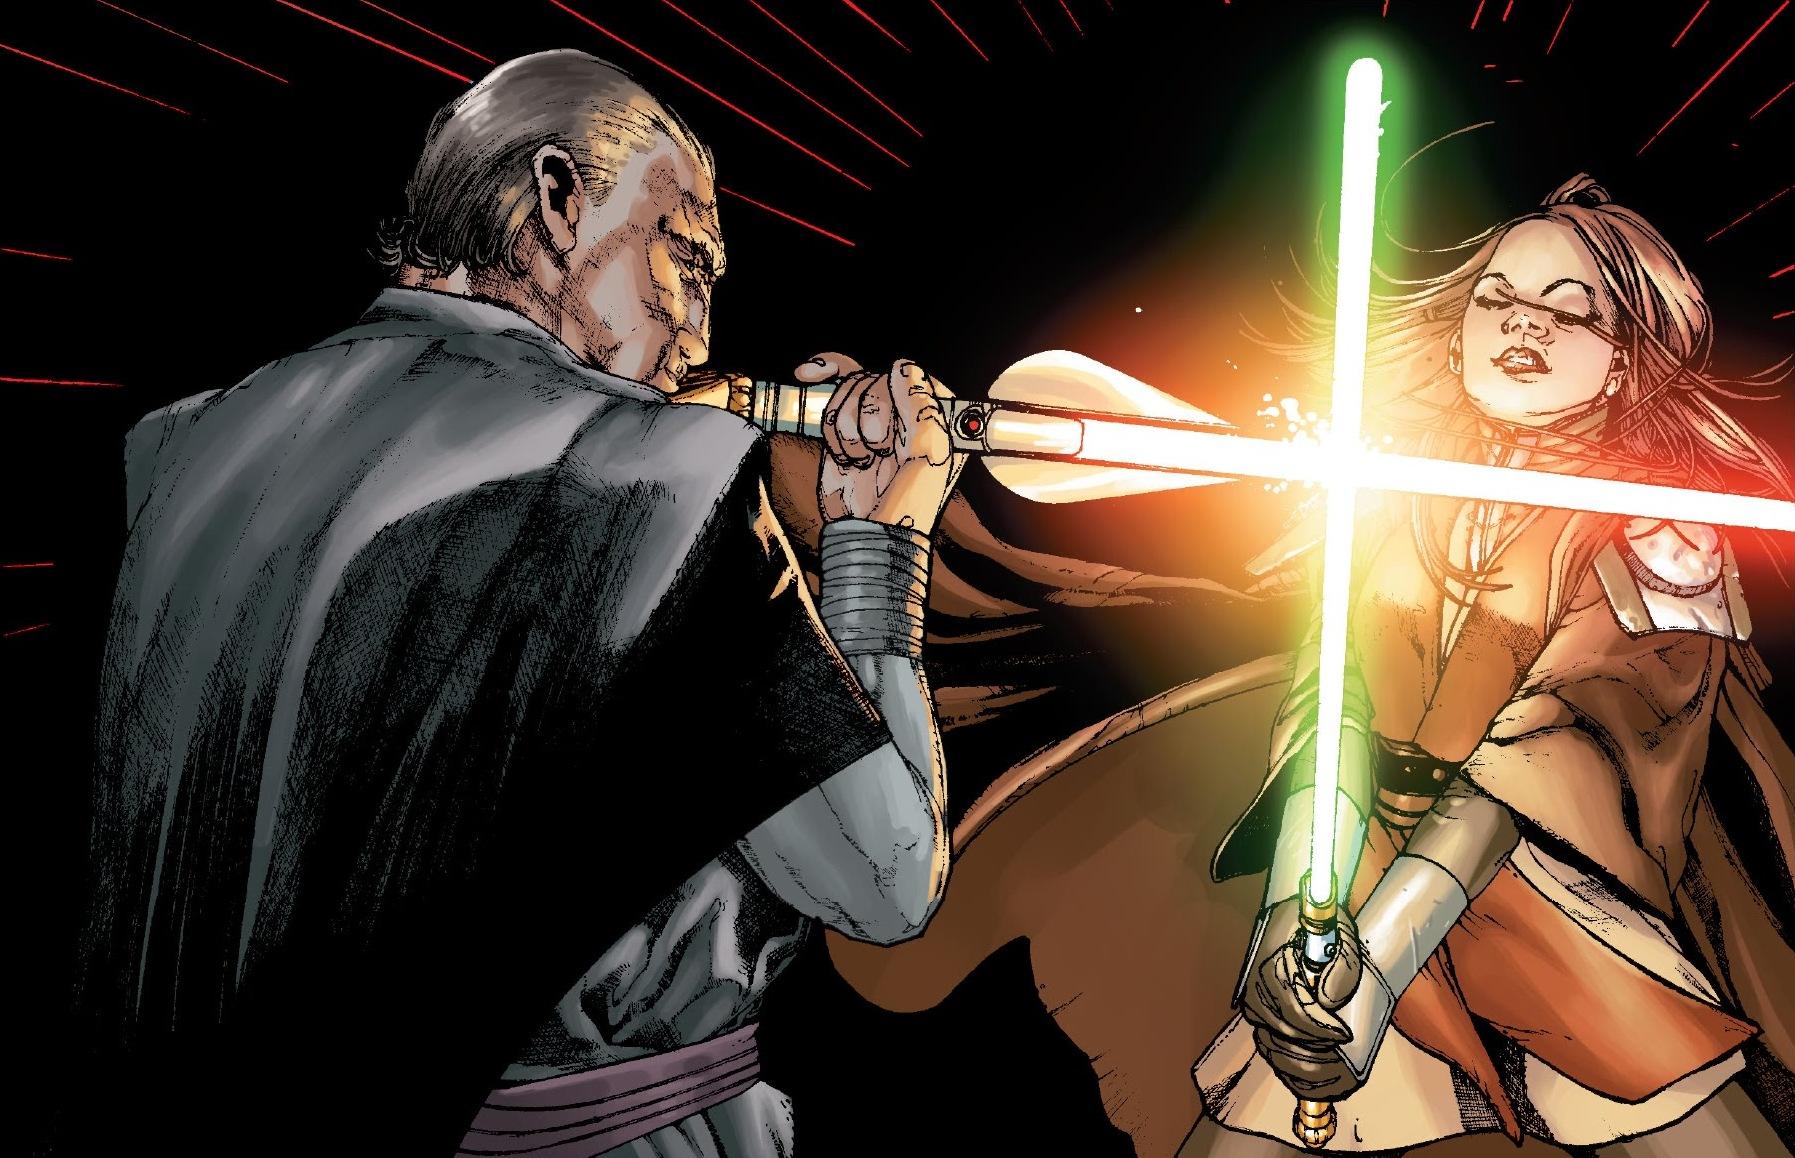 Newest Jedi Knight and younger sister to Stephany kushina Baras_vs_Satele